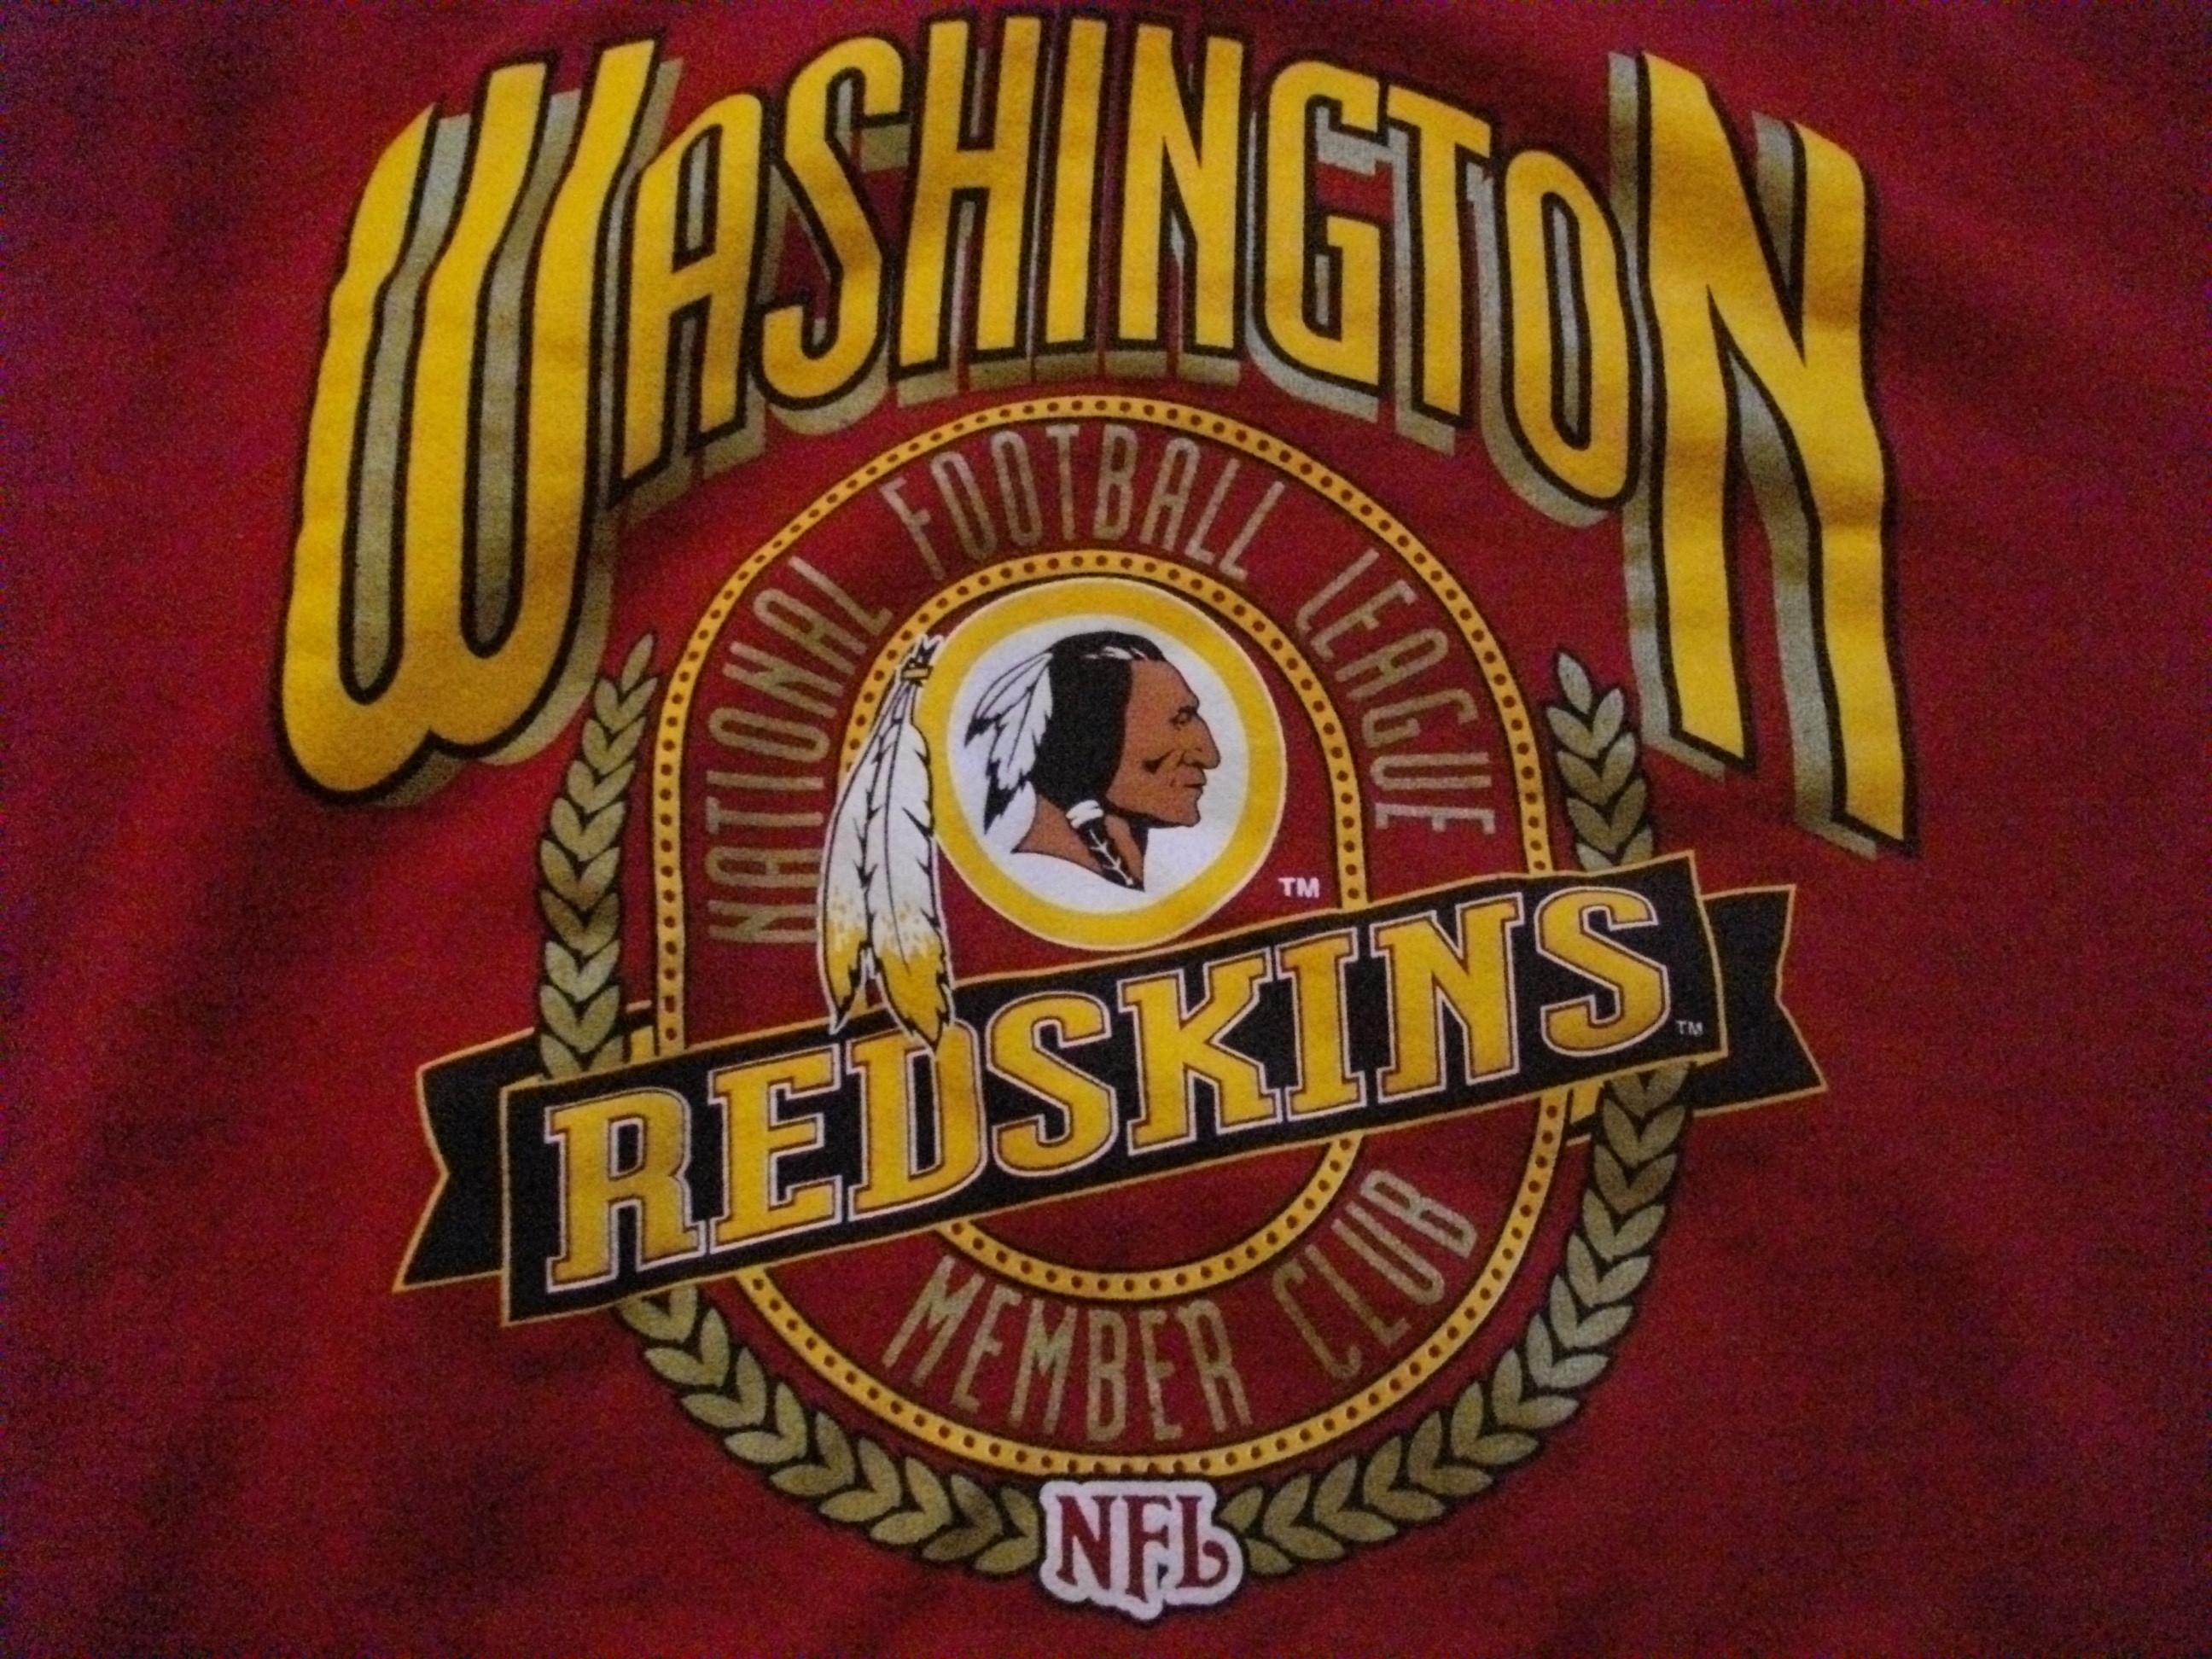 WASHINGTON REDSKINS nfl football rq_JPG wallpaper | | 155247 .